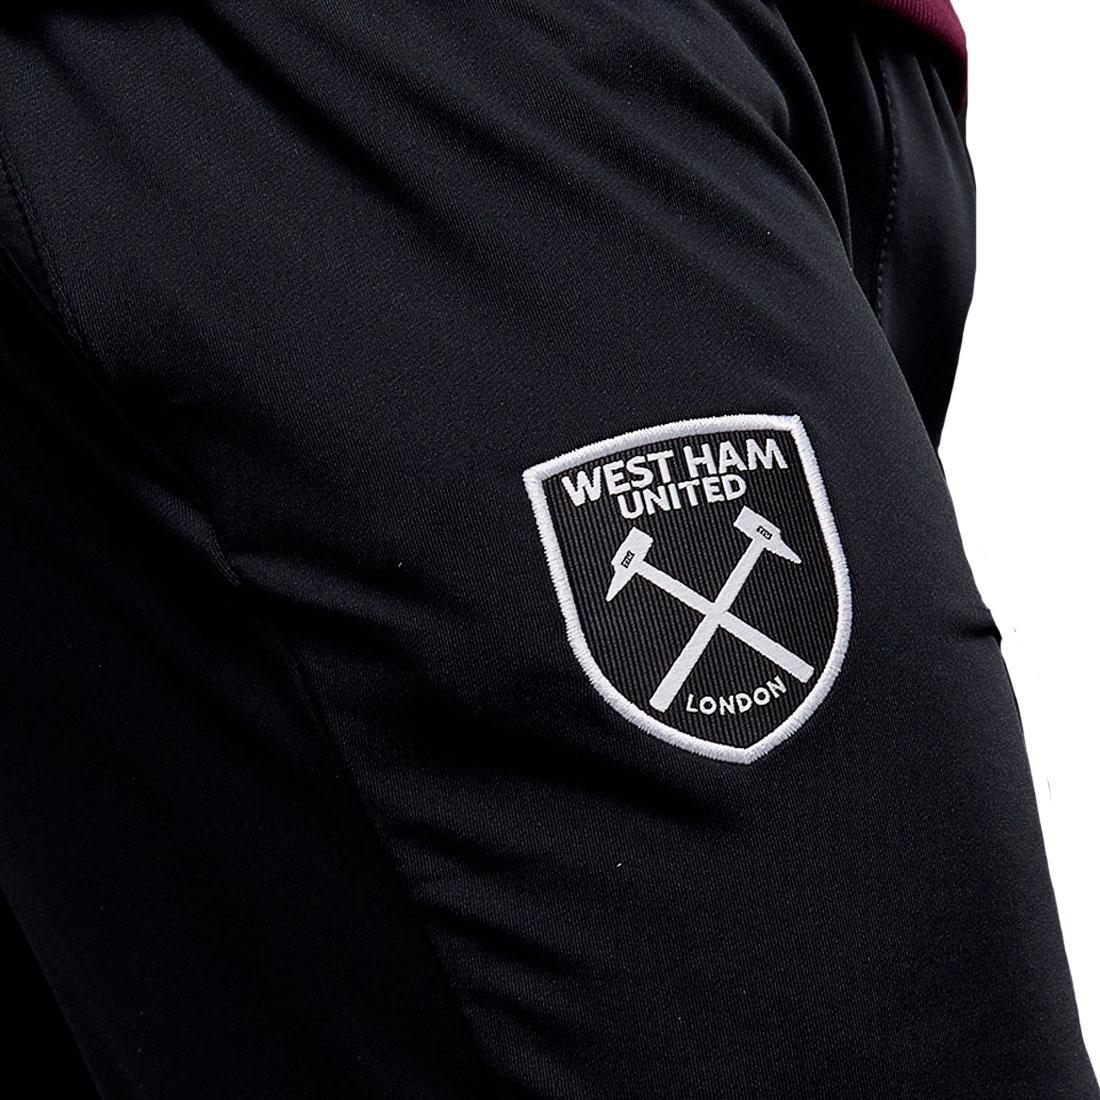 West Ham United Black Mens Tapered Slim Fit Football Training Track Pants